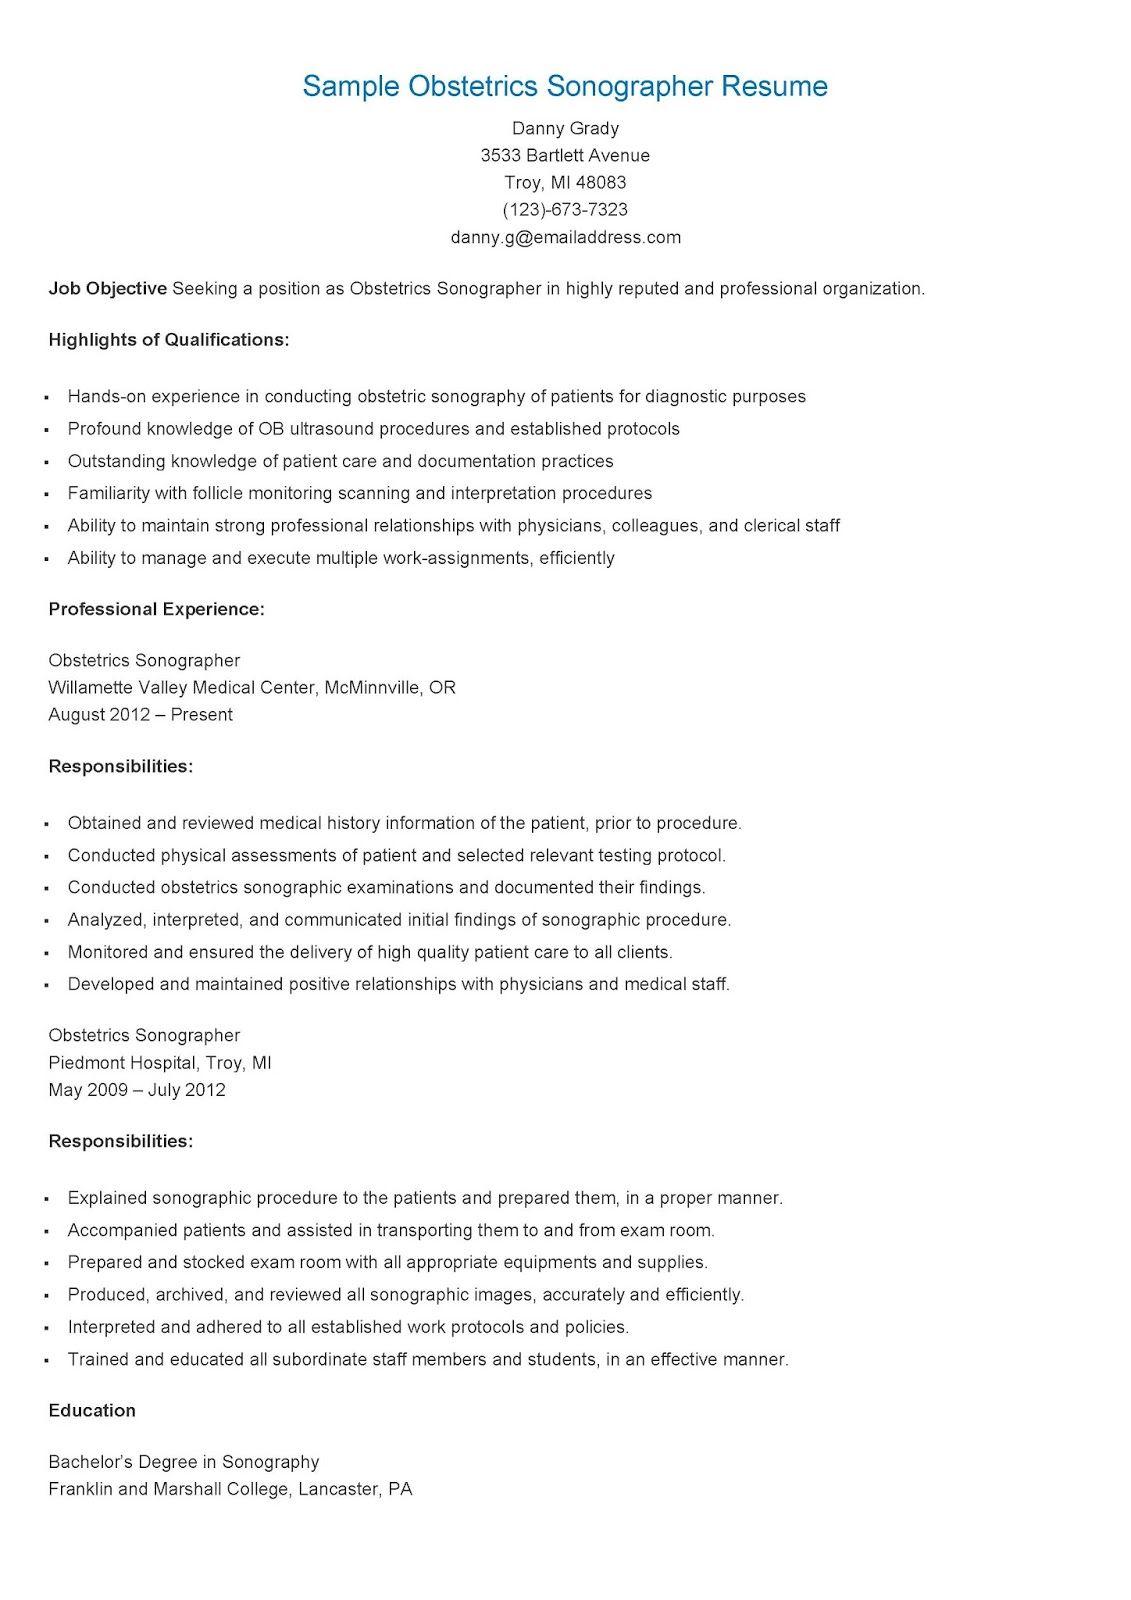 Sample Obstetrics Sonographer Resume